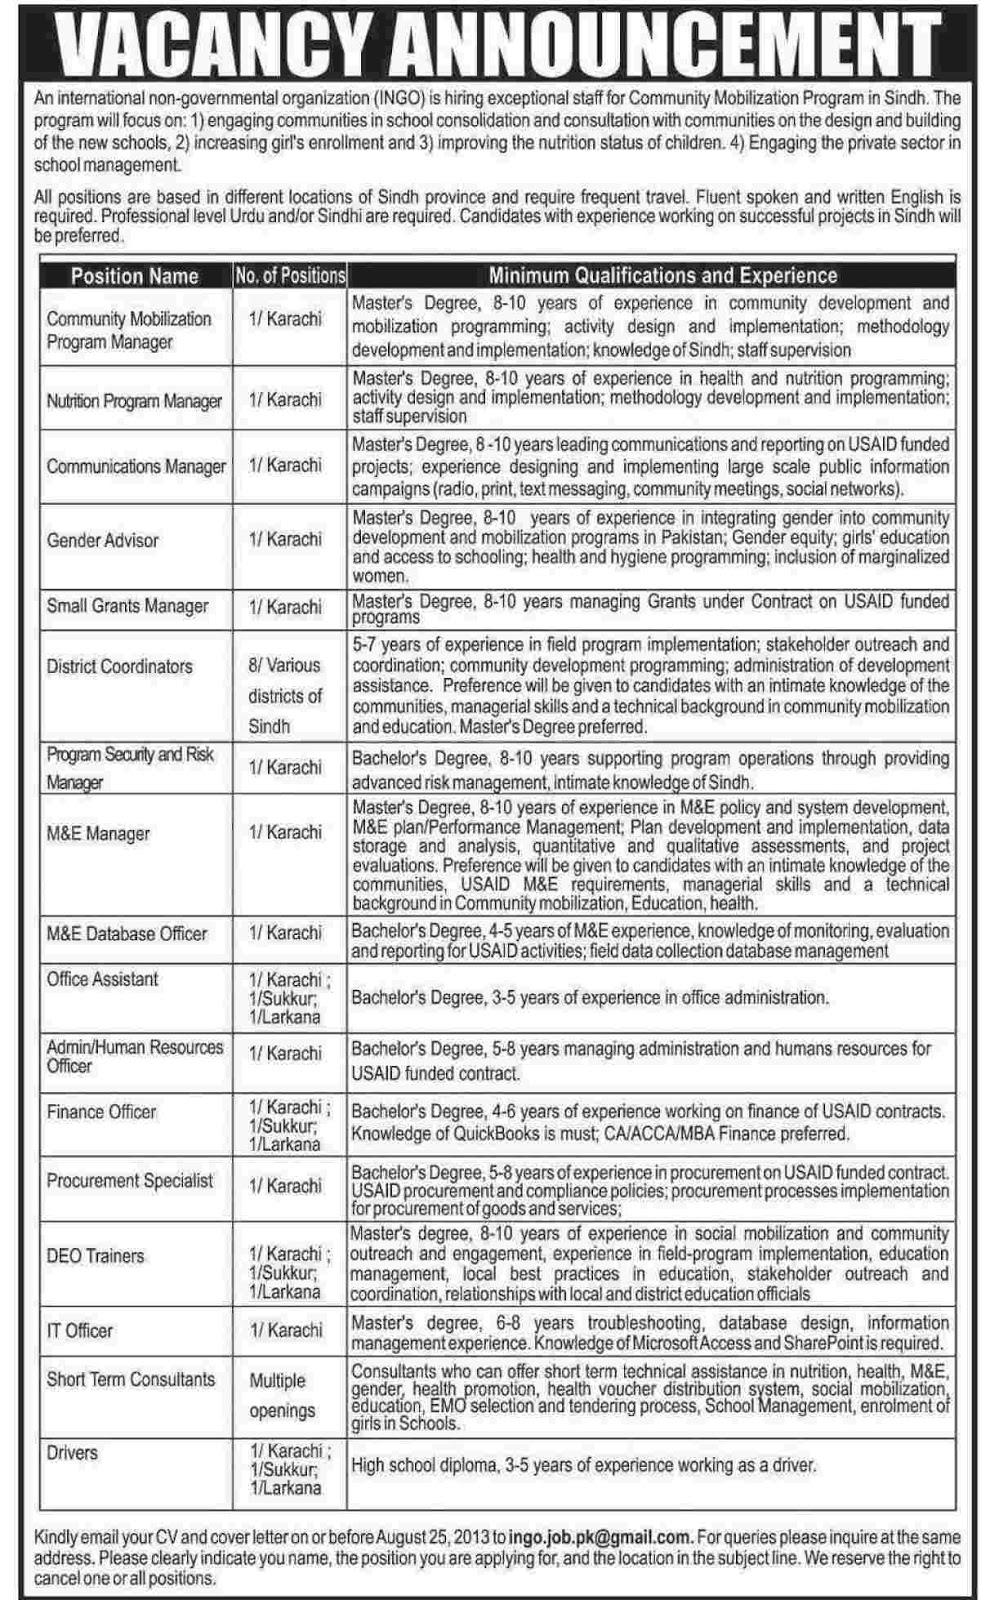 Vacancies in International NGO, Sindh